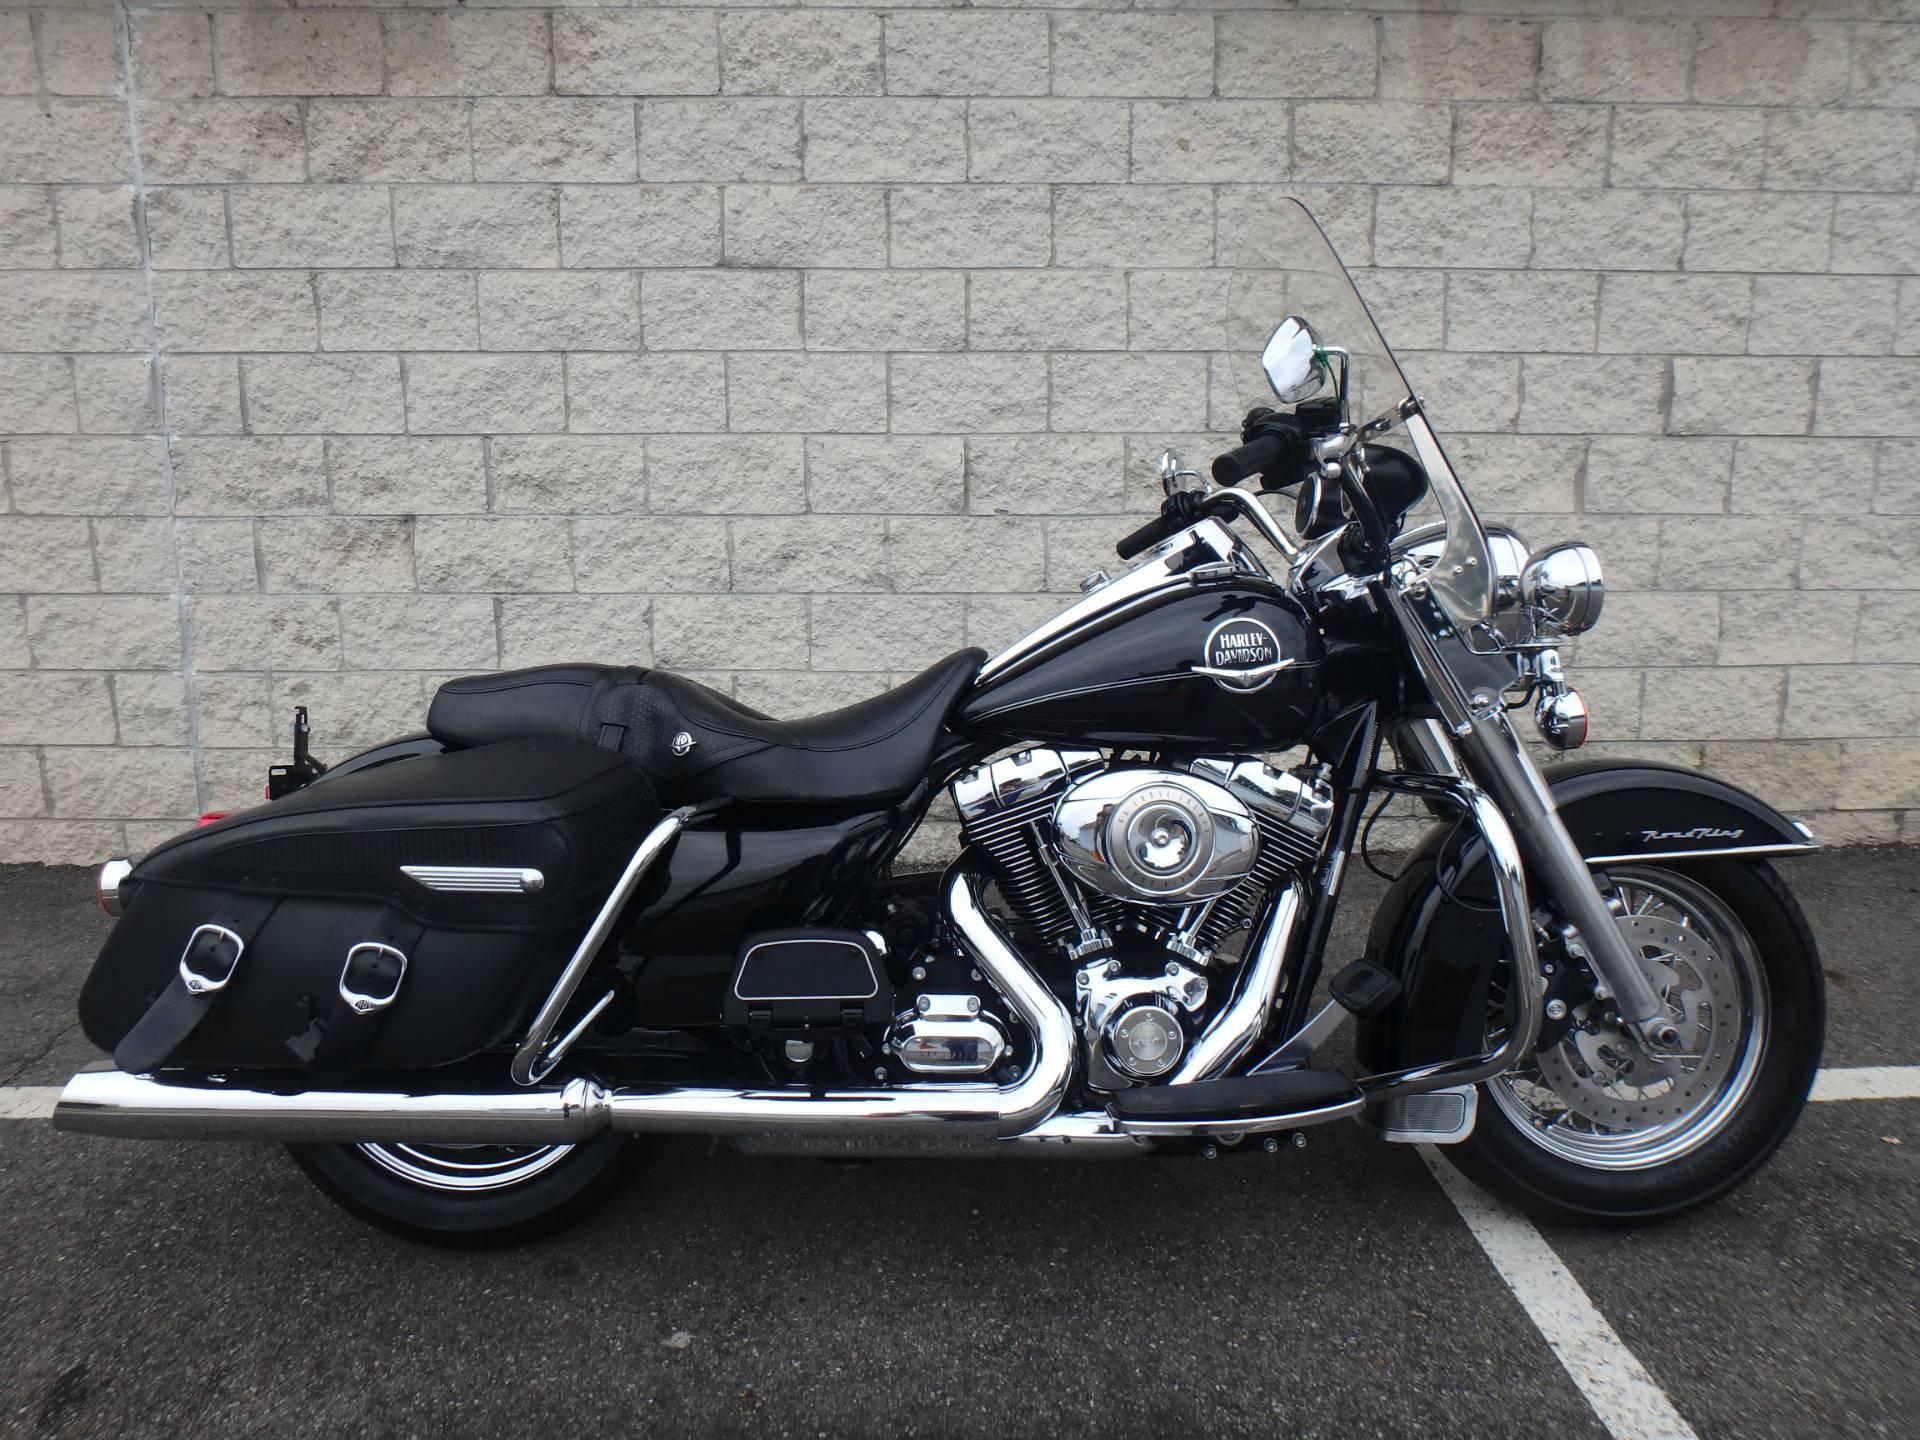 2010 Harley-Davidson Road King Classic 1